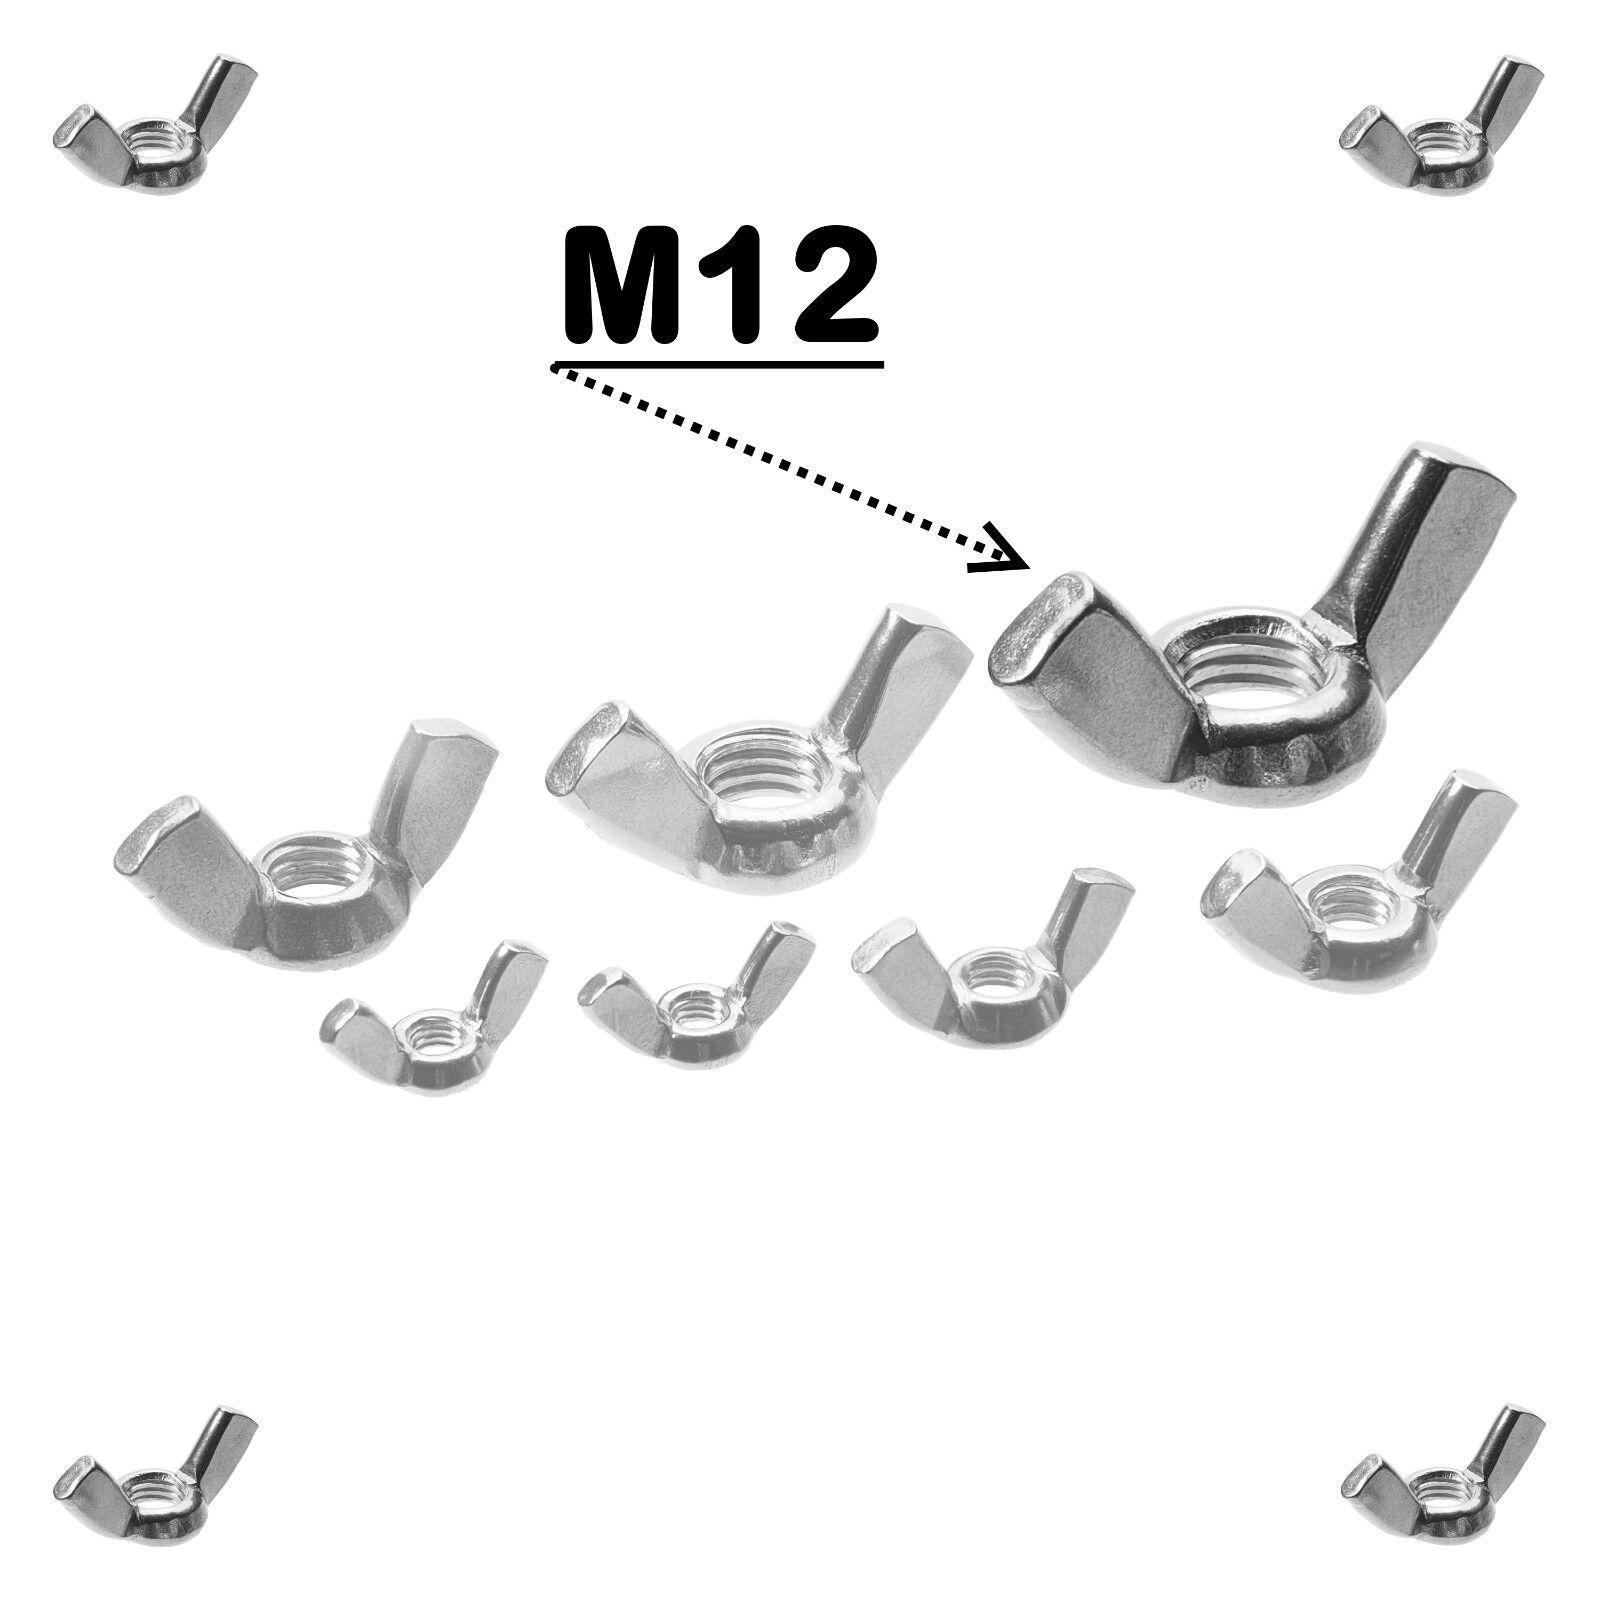 Flügelmuttern Edelstahl DIN 315 VA A2 V2A V2A V2A M3 M4 M5 M6 M8 M10 M12 M14 M16 M18 M20     | Erste Klasse in seiner Klasse  511869